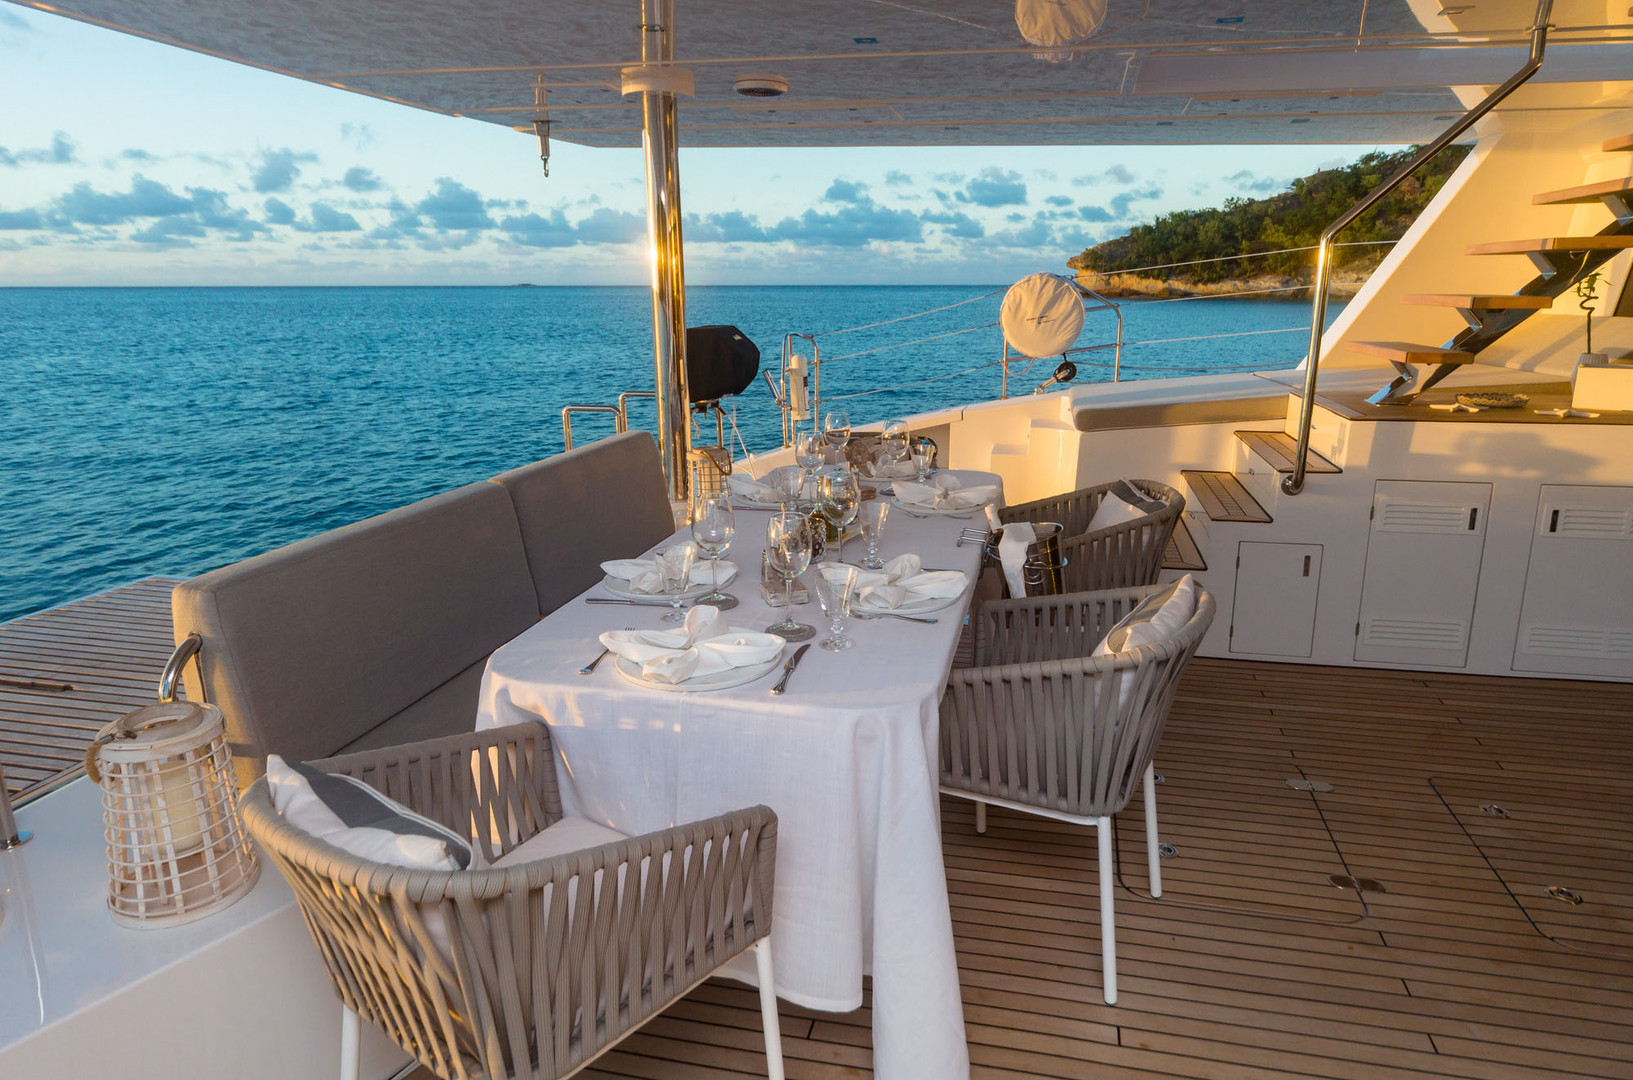 Yacht CALMAO - aft deck dining